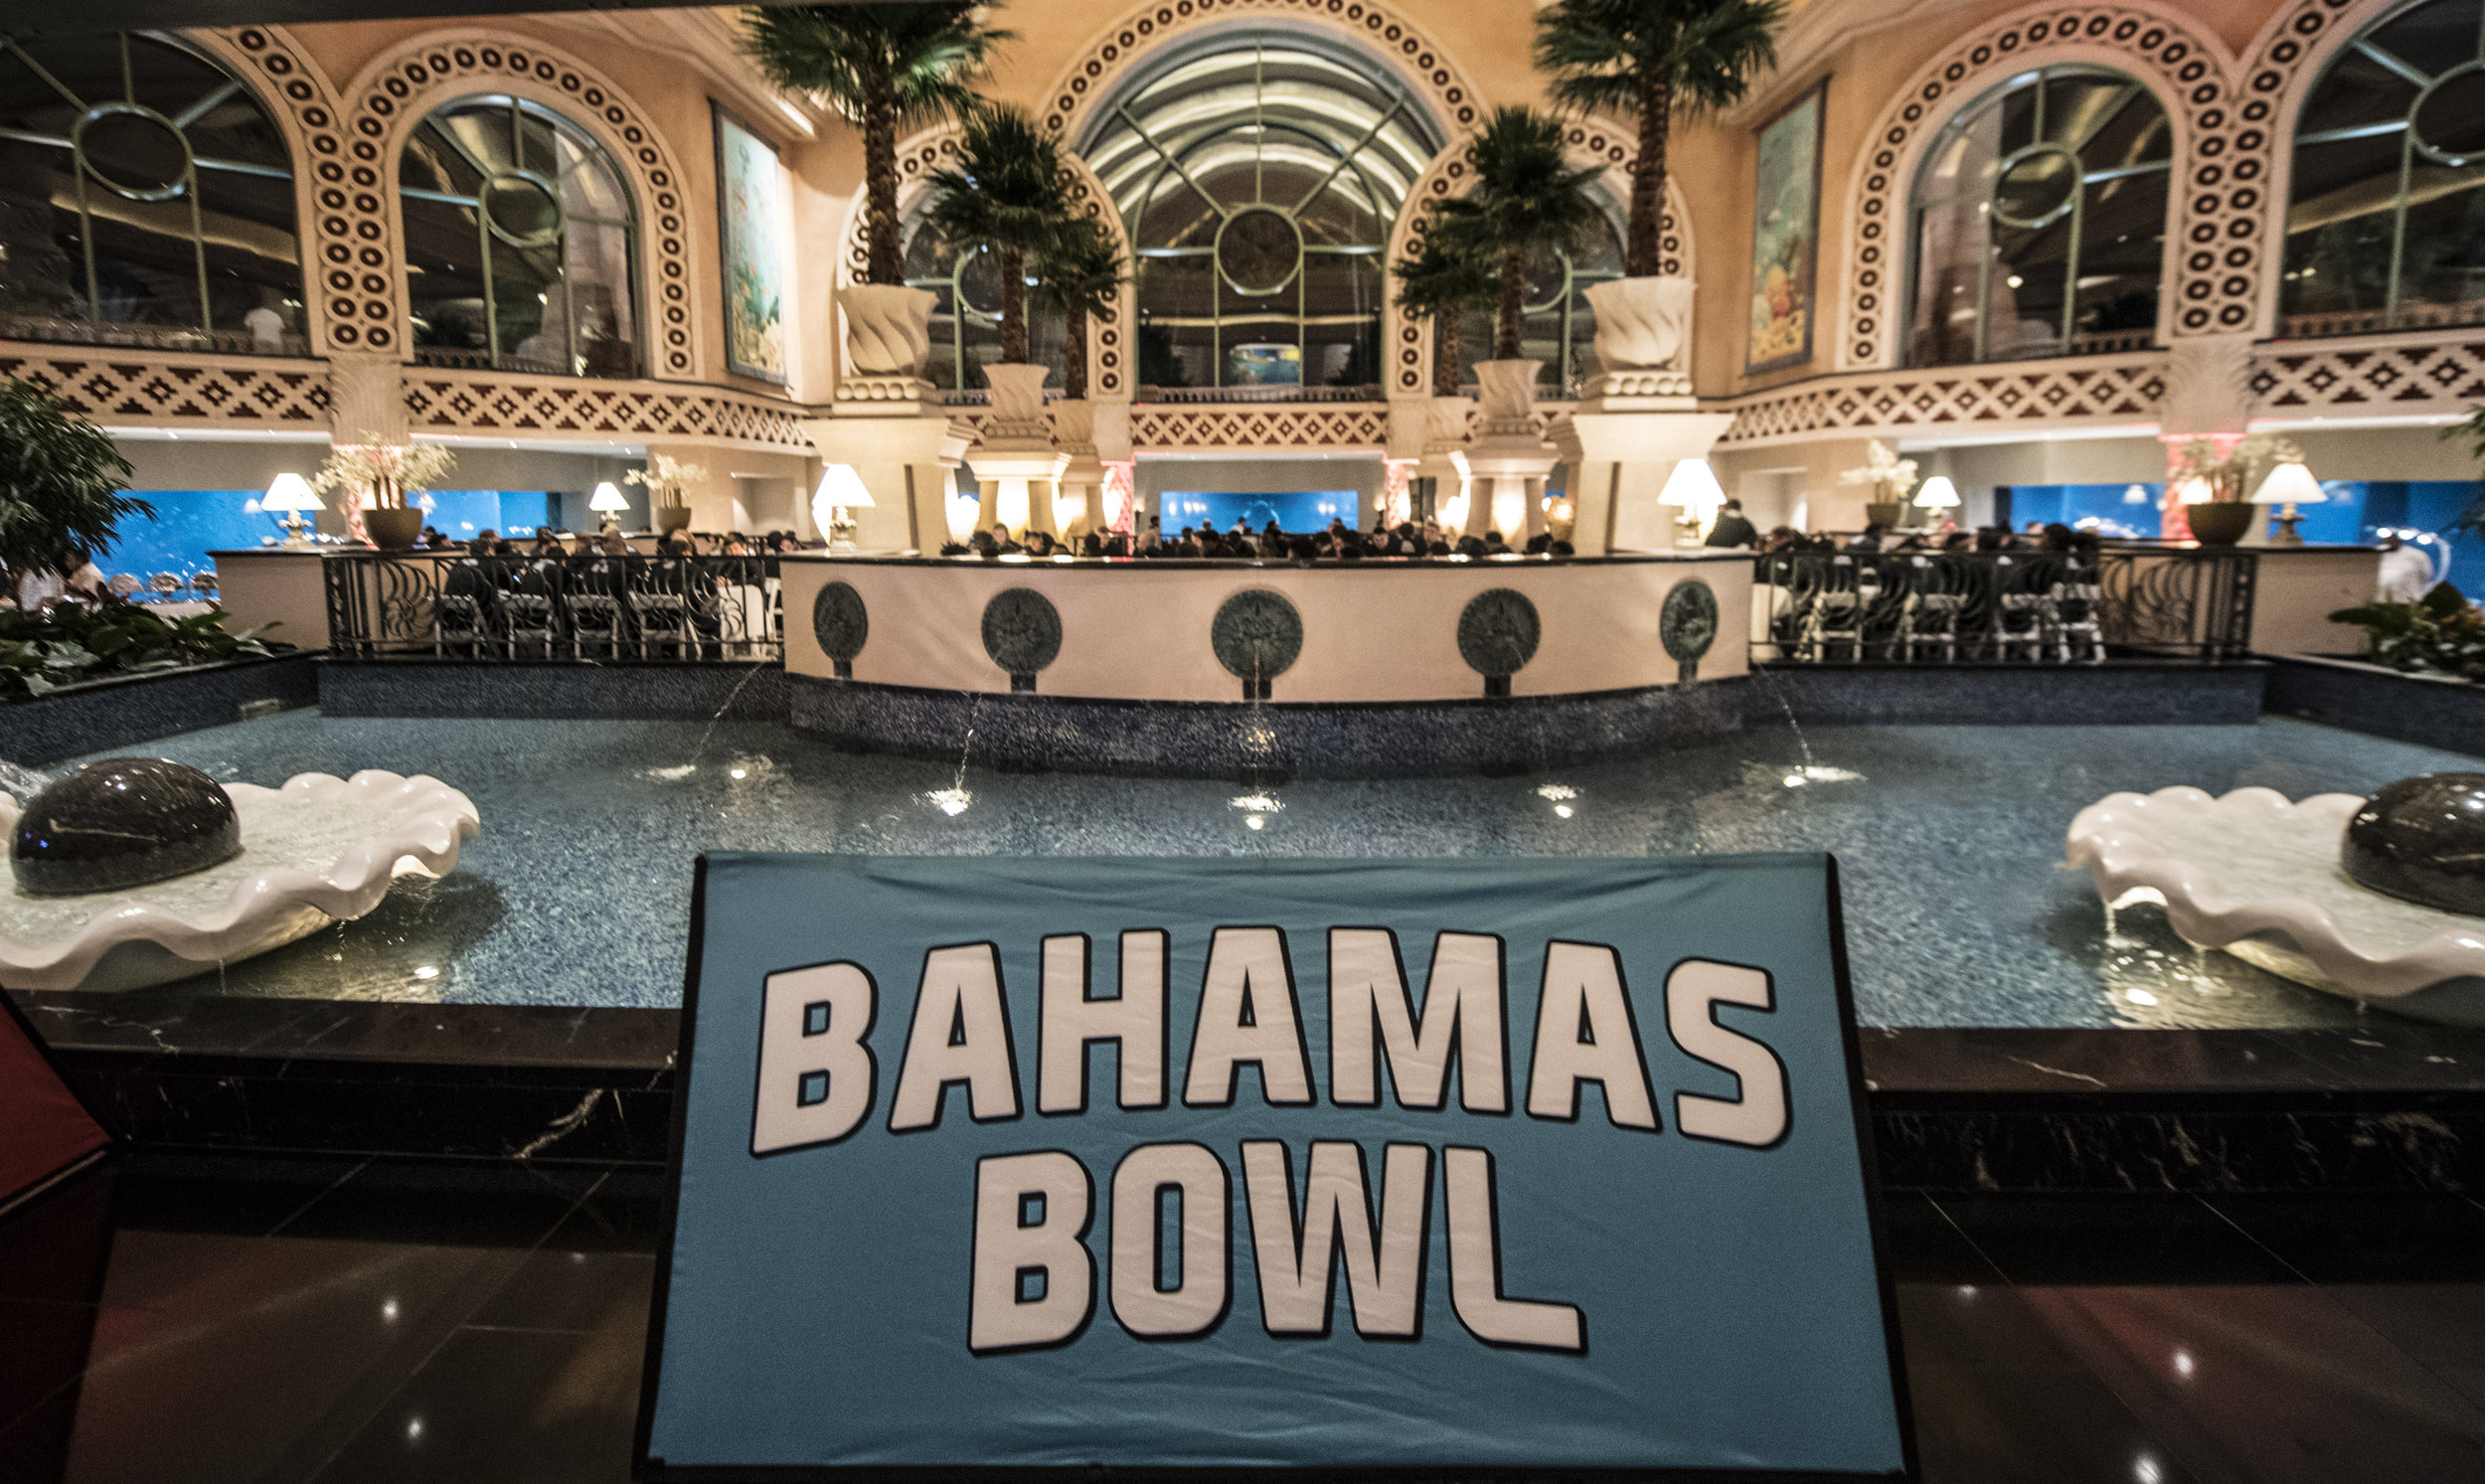 20171218_ESPN_BahamasBowl_Day_1_051.JPG